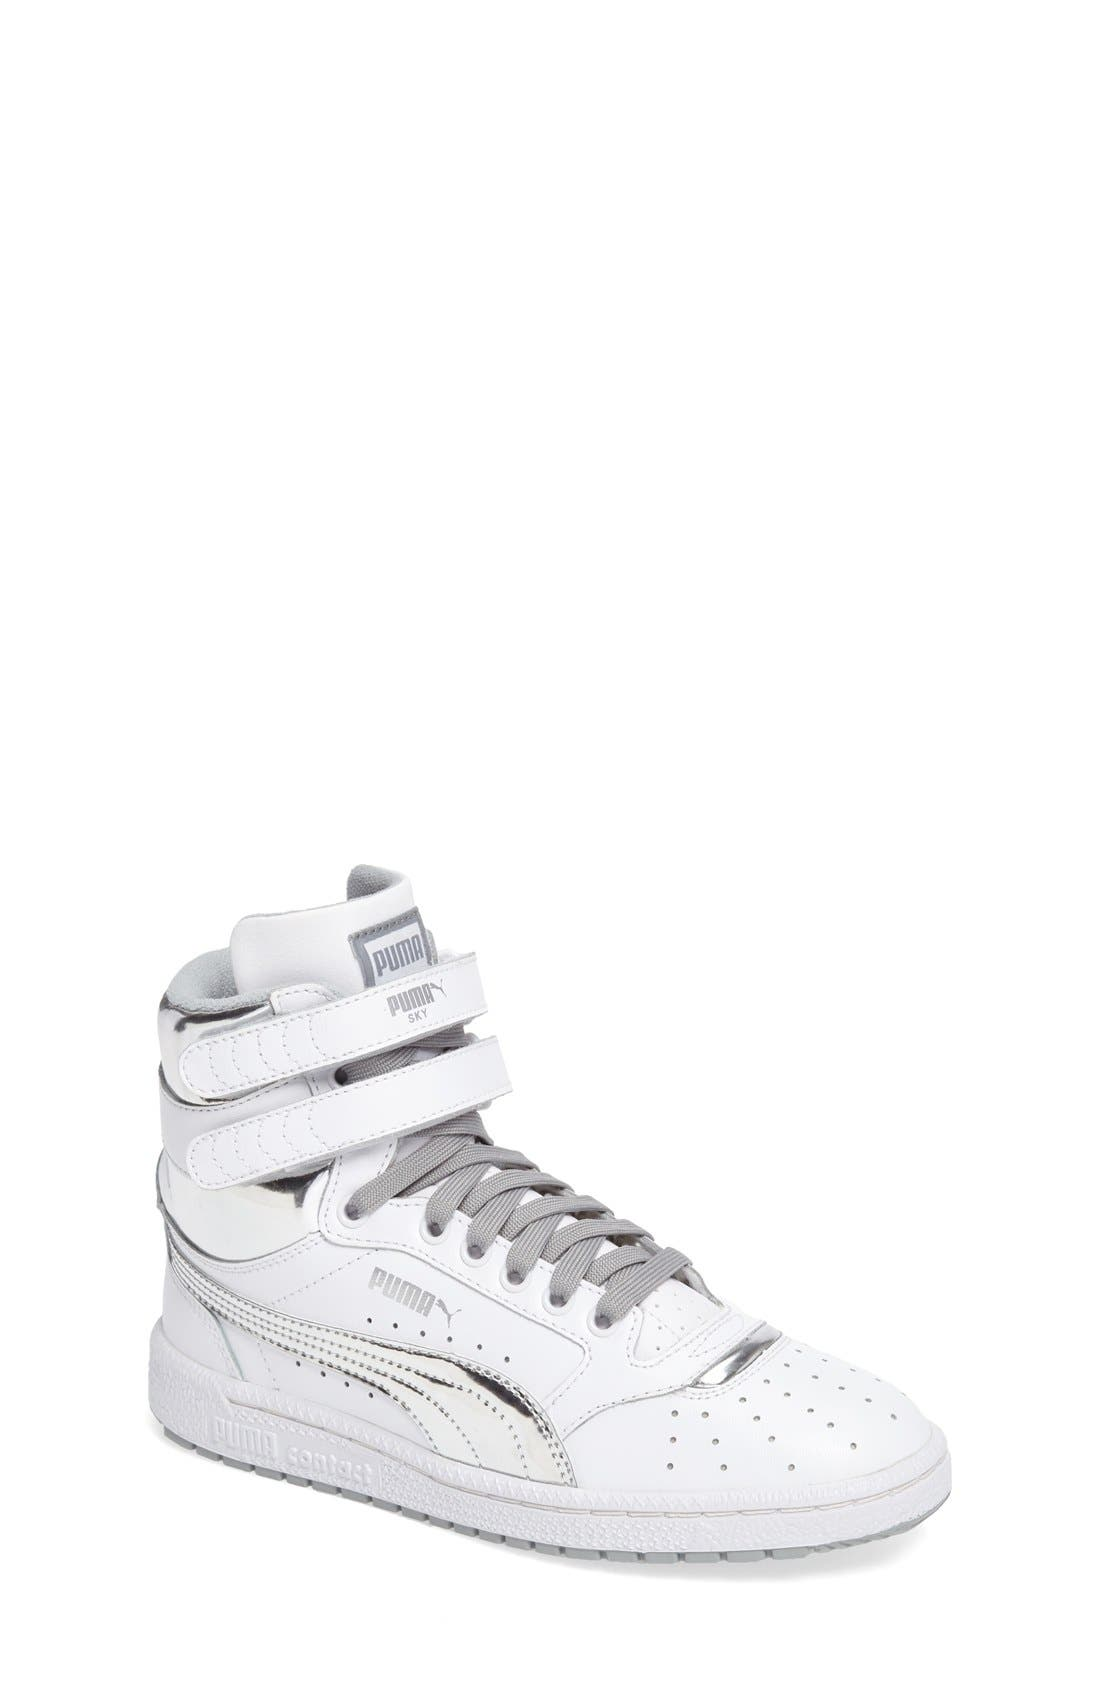 Sky II Hi Foil Jr Sneaker,                         Main,                         color, 100